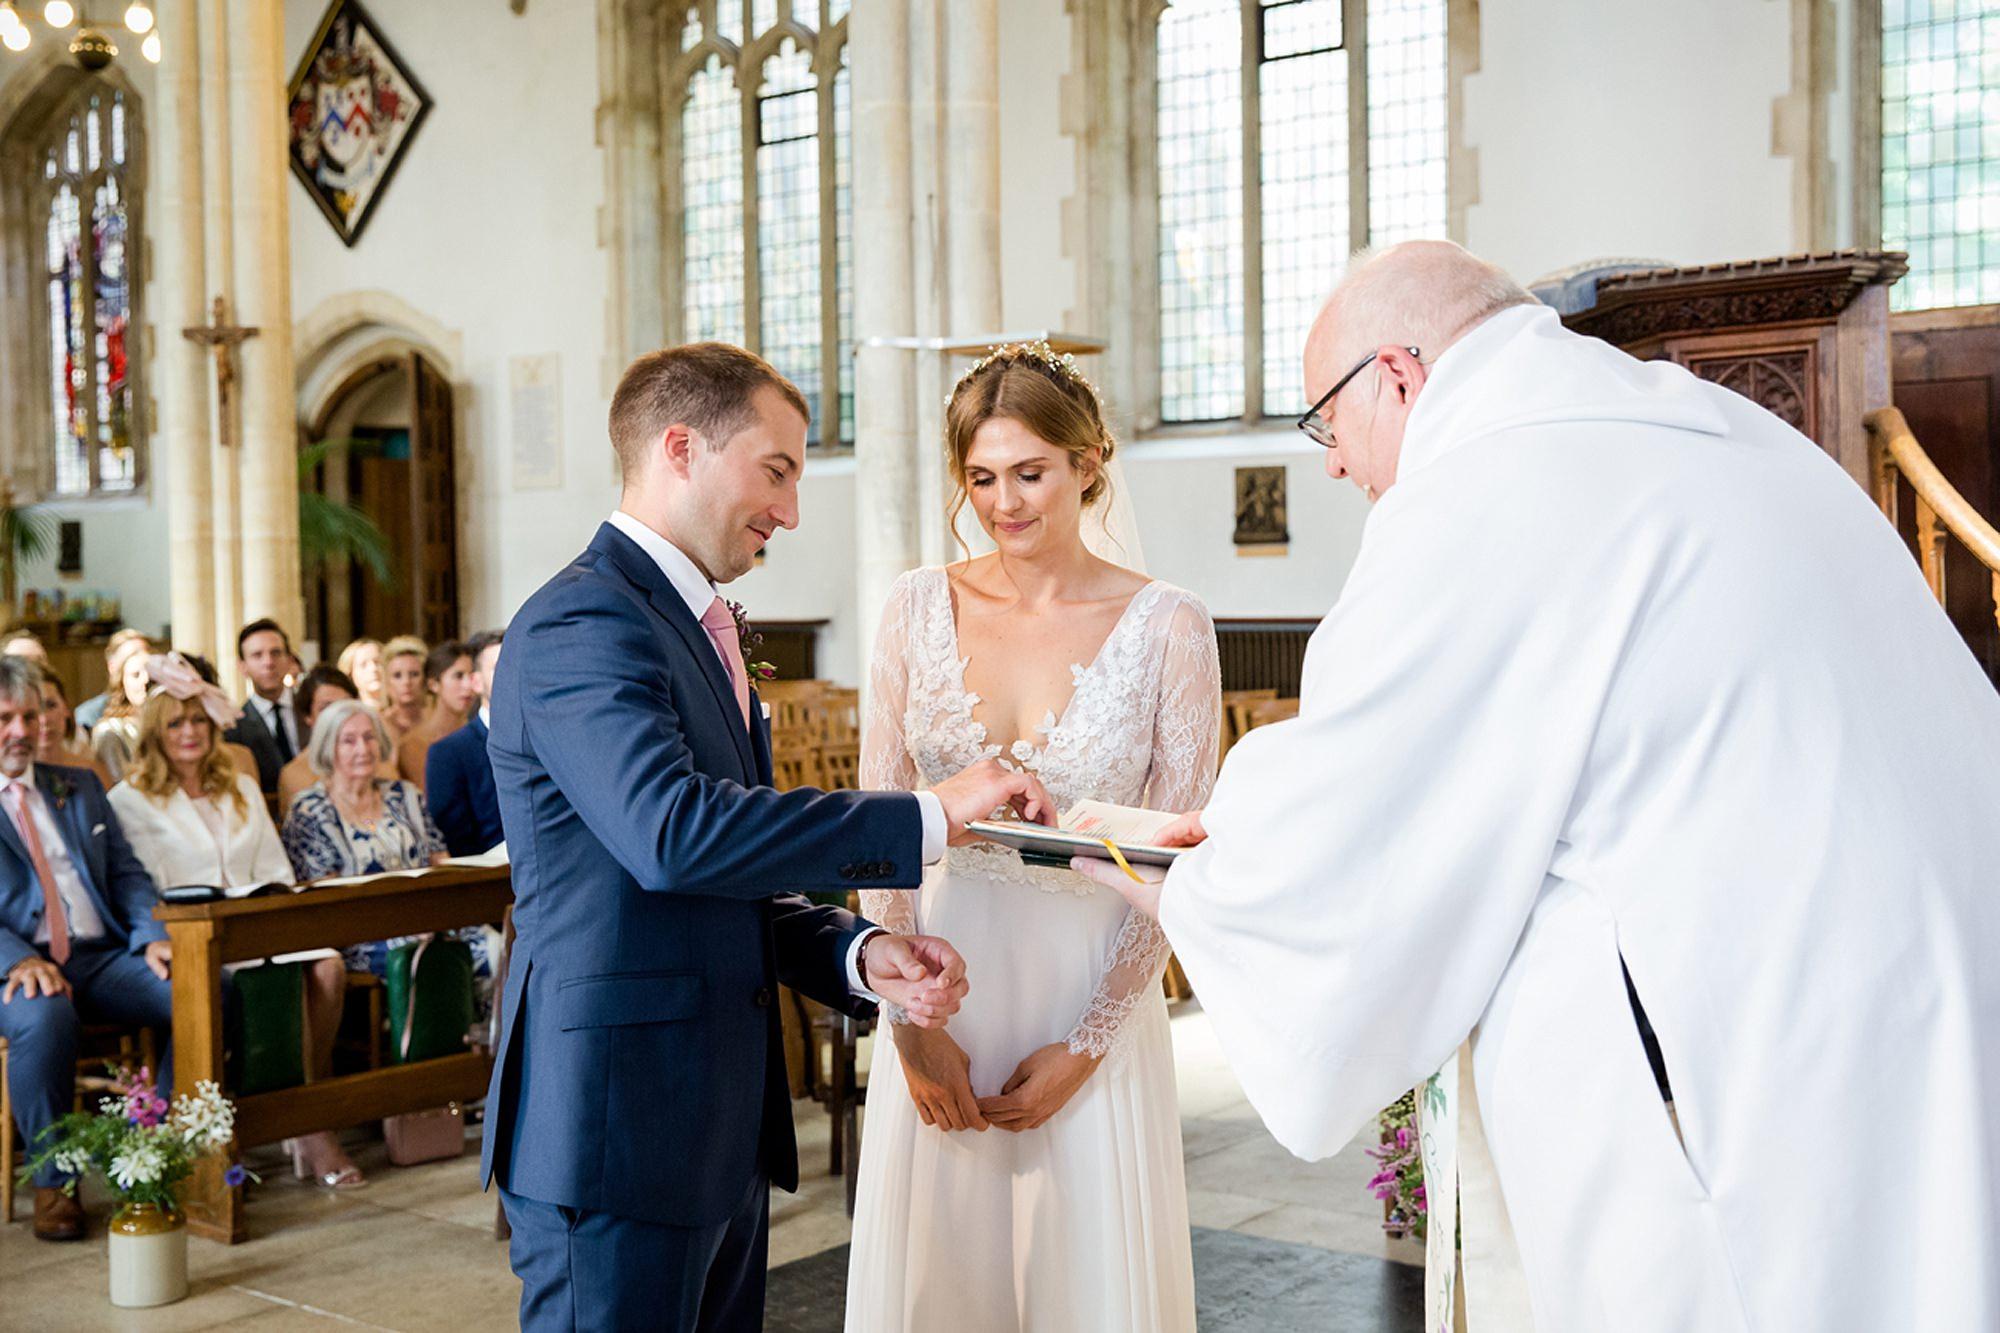 Marks Hall Estate wedding photography bride and groom wedding ceremony